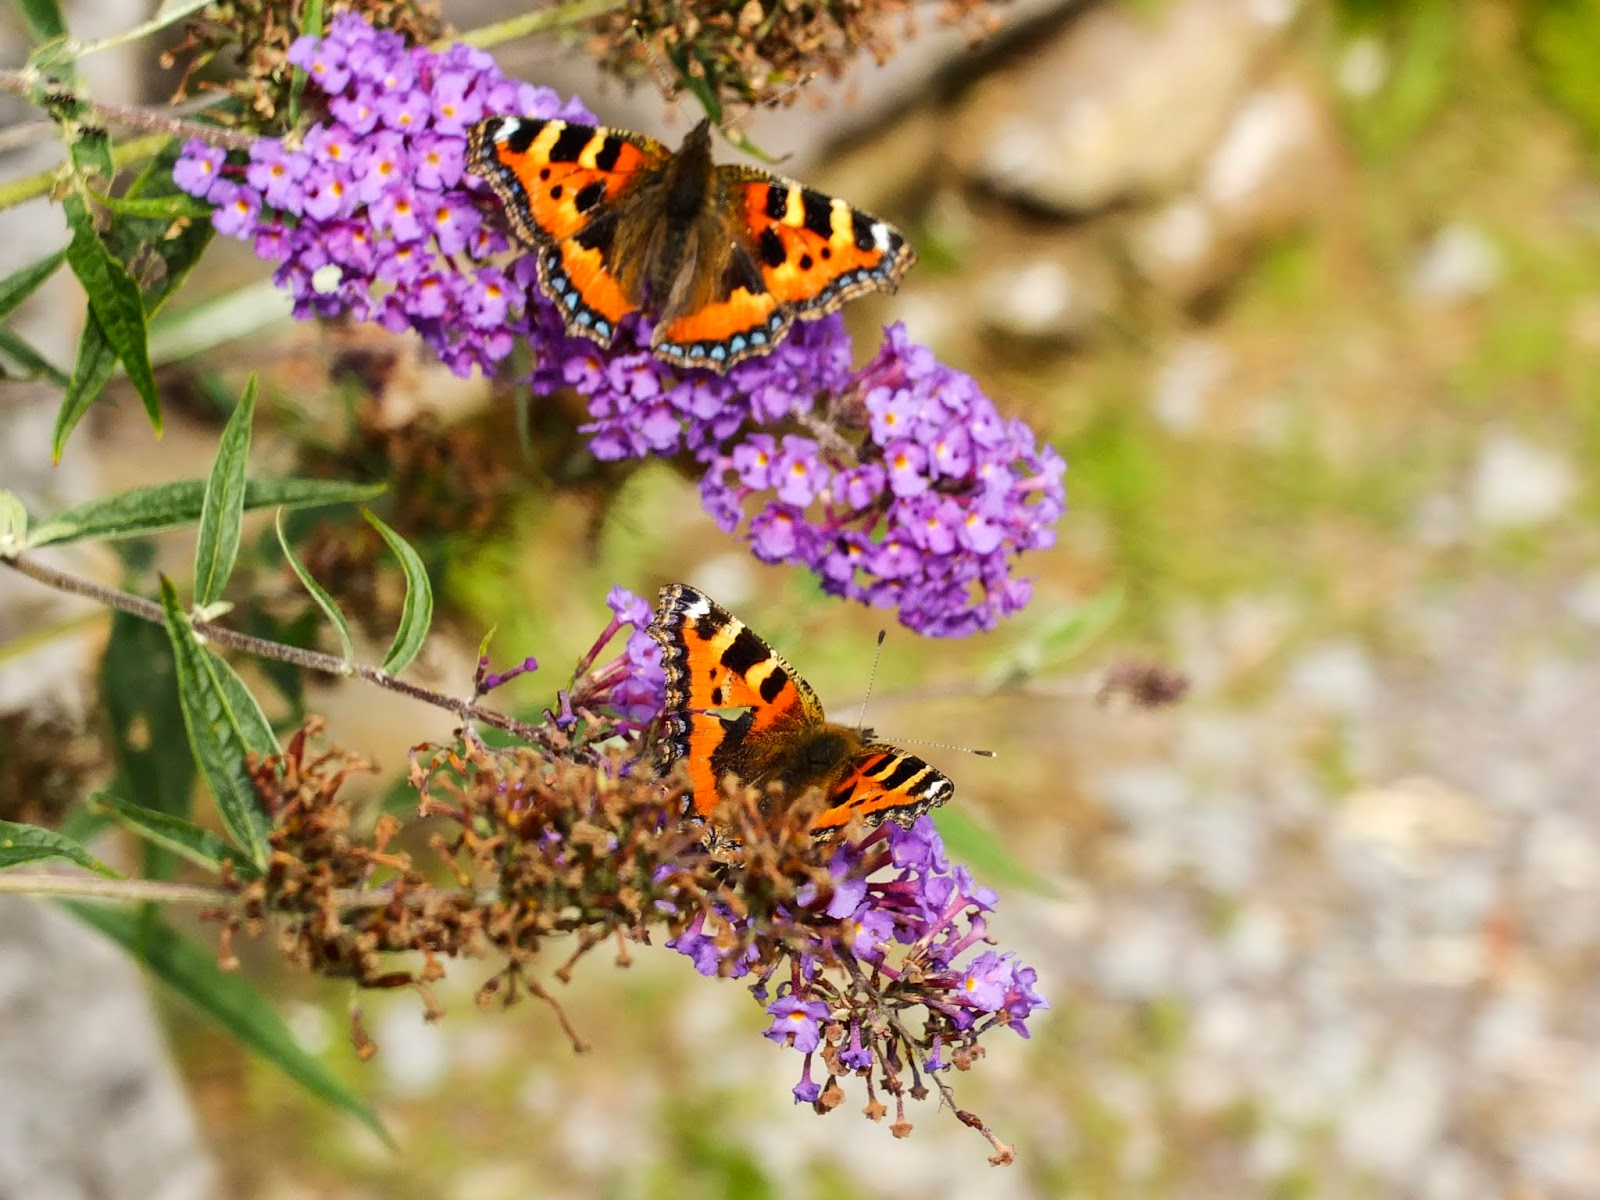 Two butterflies on flowers of the Butterfly Bush.